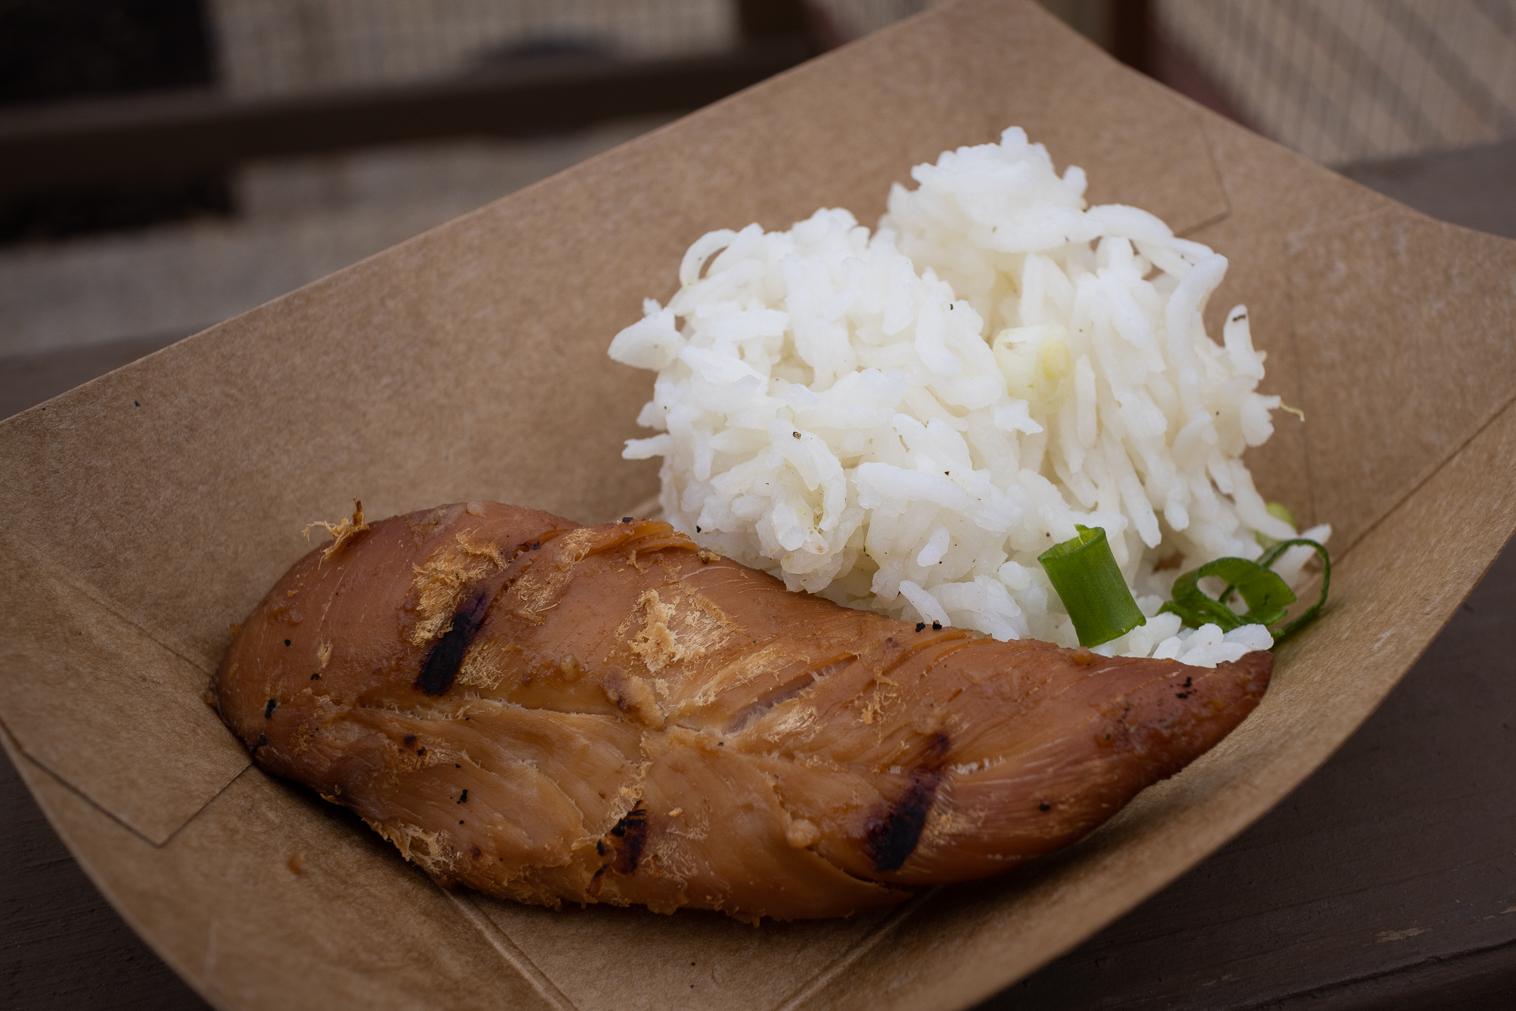 Busch Gardens Williamsburg Food and Wine Festival 2019 Chicken Bulgogi